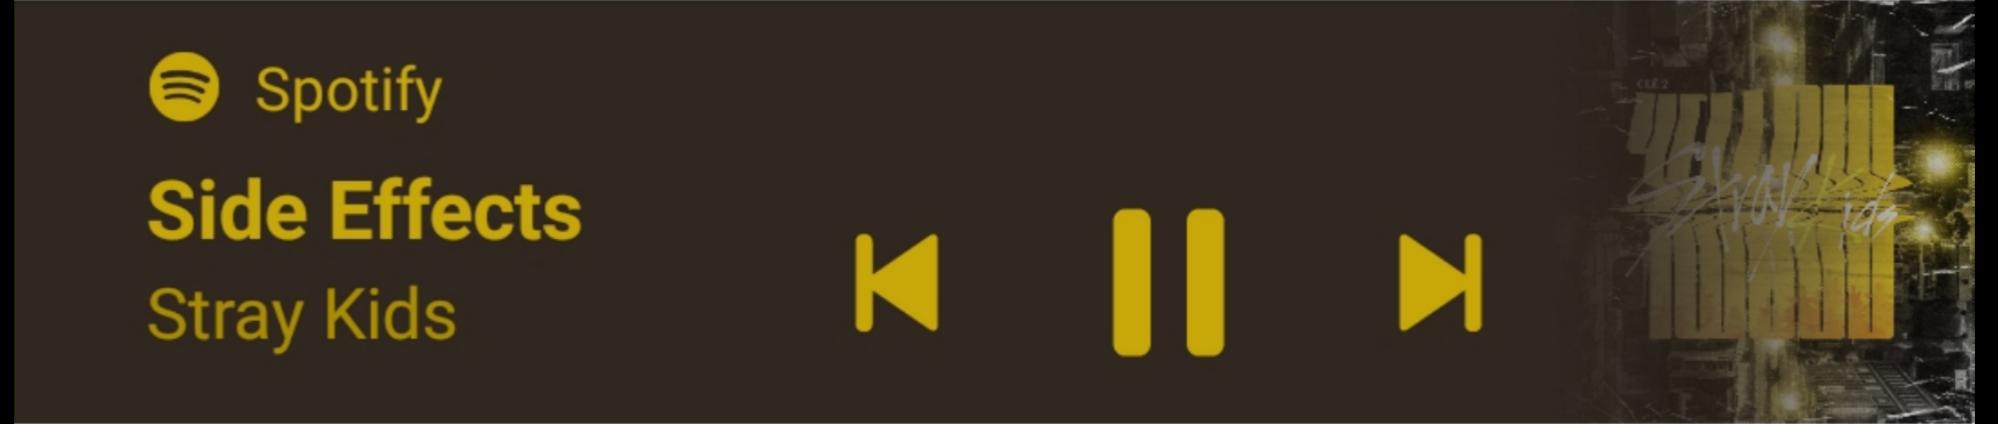 #straykids #straykidssticker #kpop #koreanidol #miroh #spotify